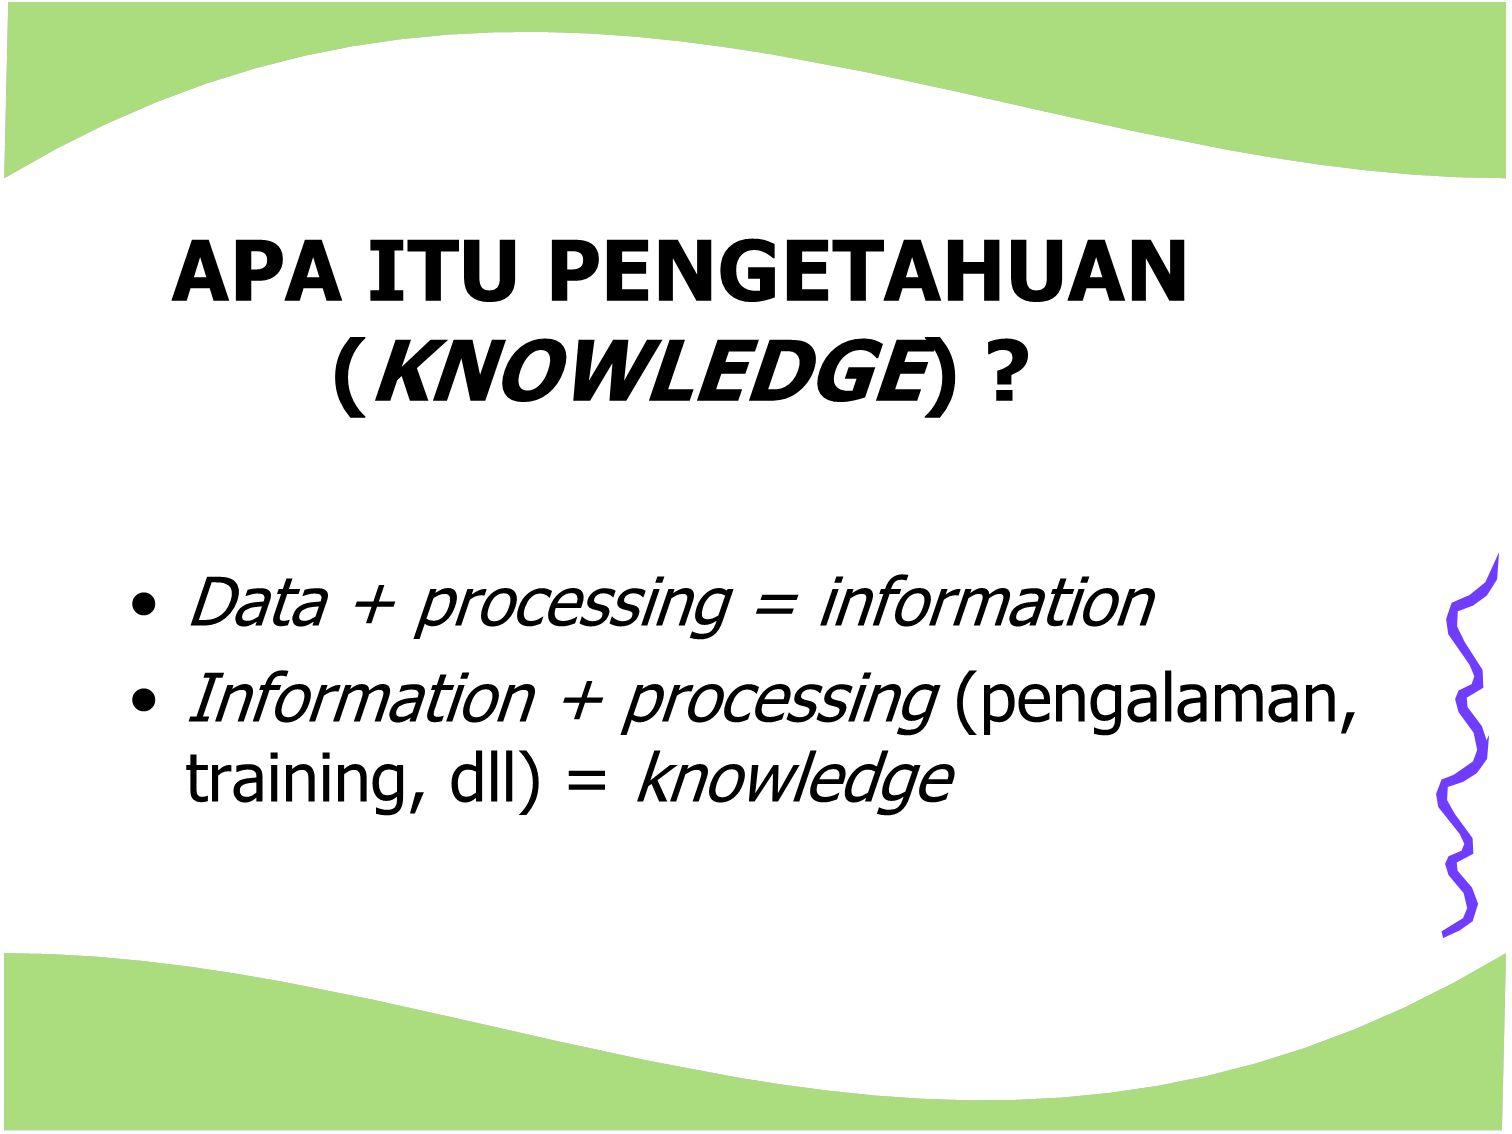 APA ITU PENGETAHUAN (KNOWLEDGE) ? Data + processing = information Information + processing (pengalaman, training, dll) = knowledge